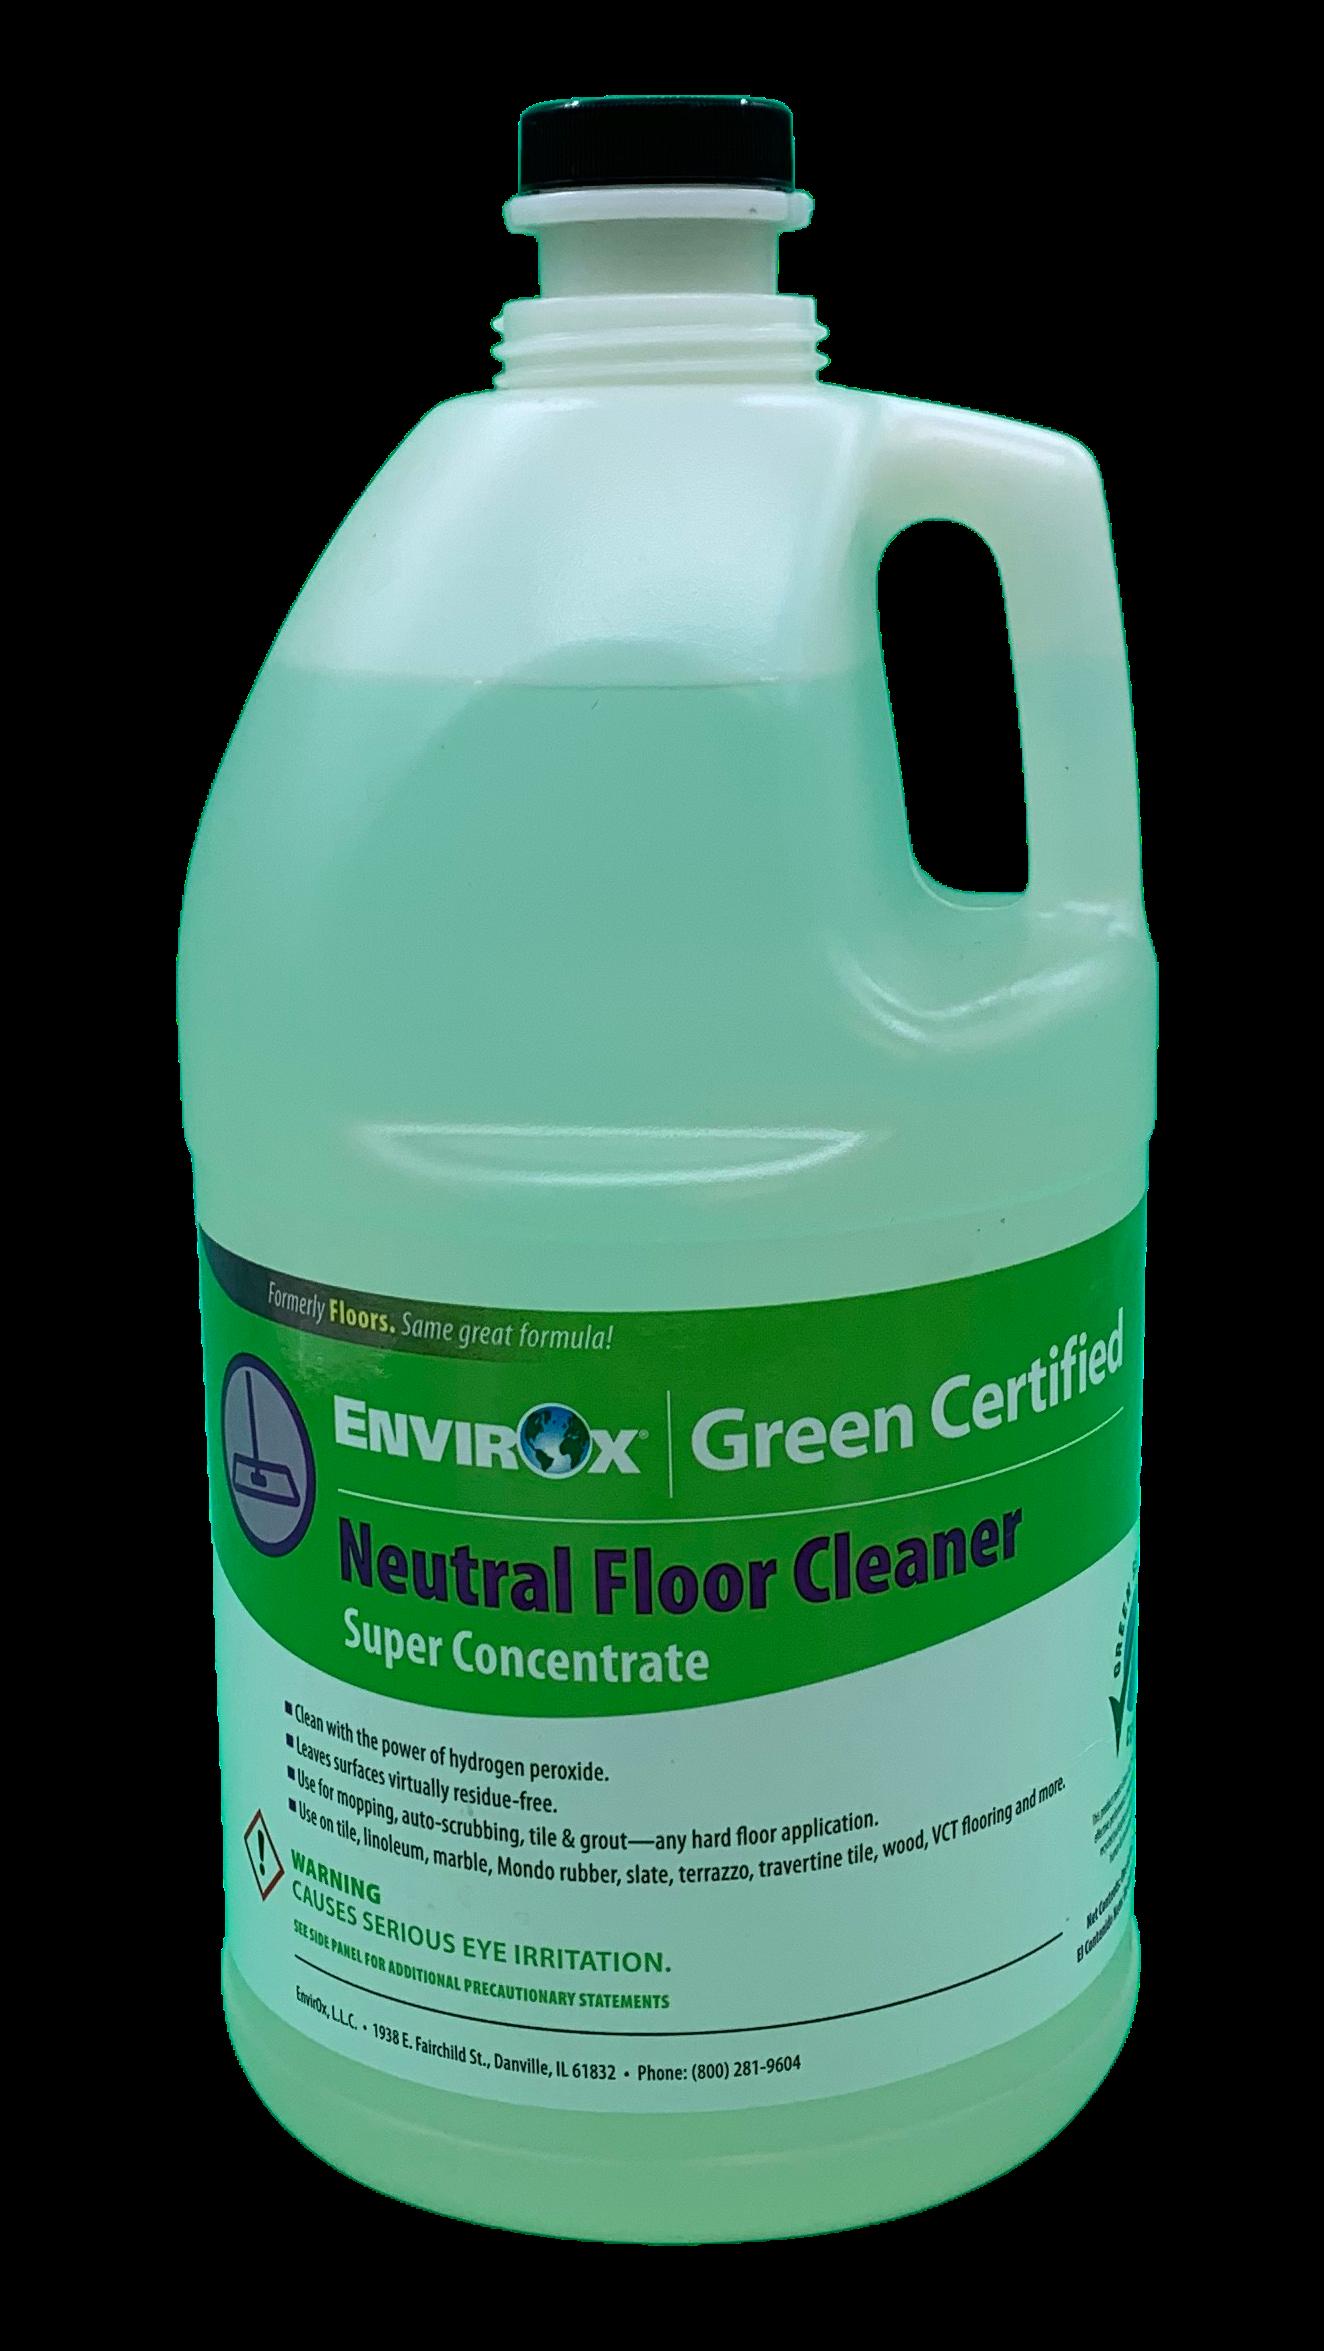 Envirox 'Super Concentrate: Floors'